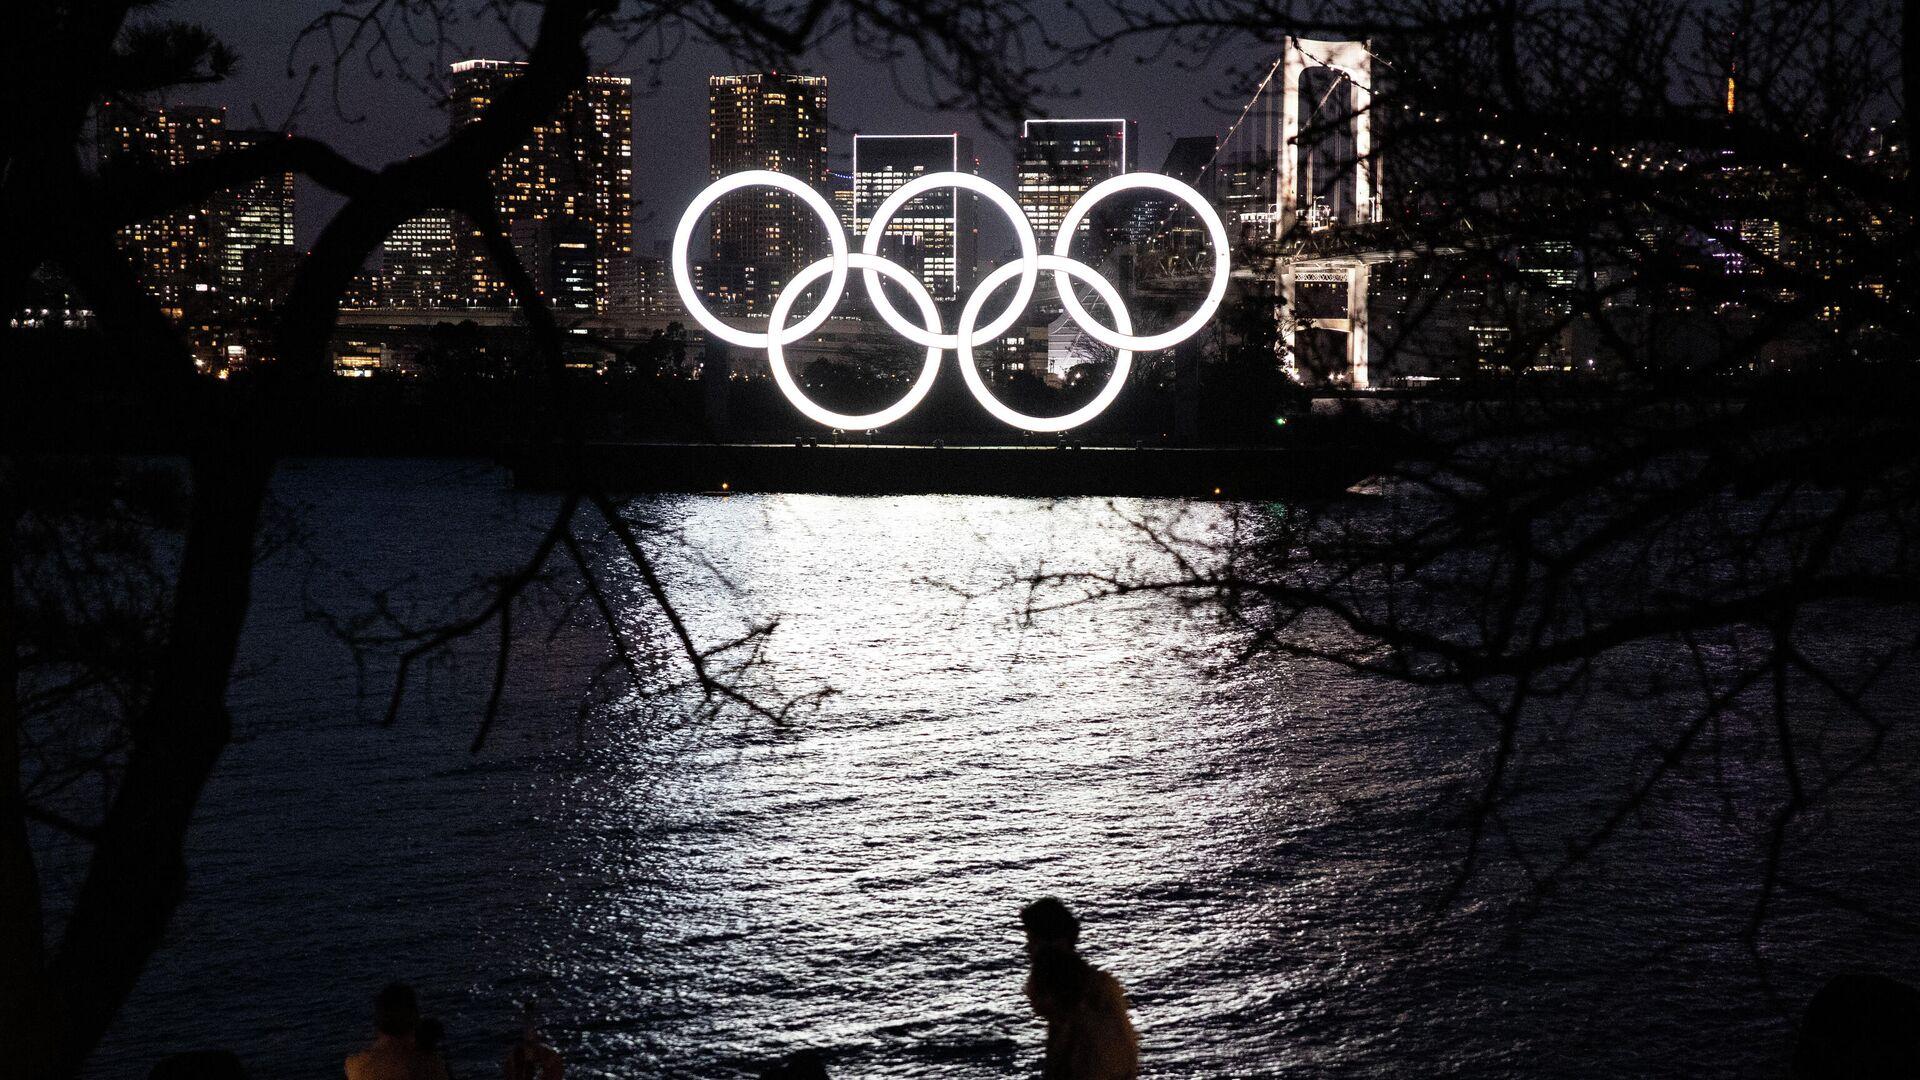 Олимпийские кольца в Токио - РИА Новости, 1920, 20.06.2021